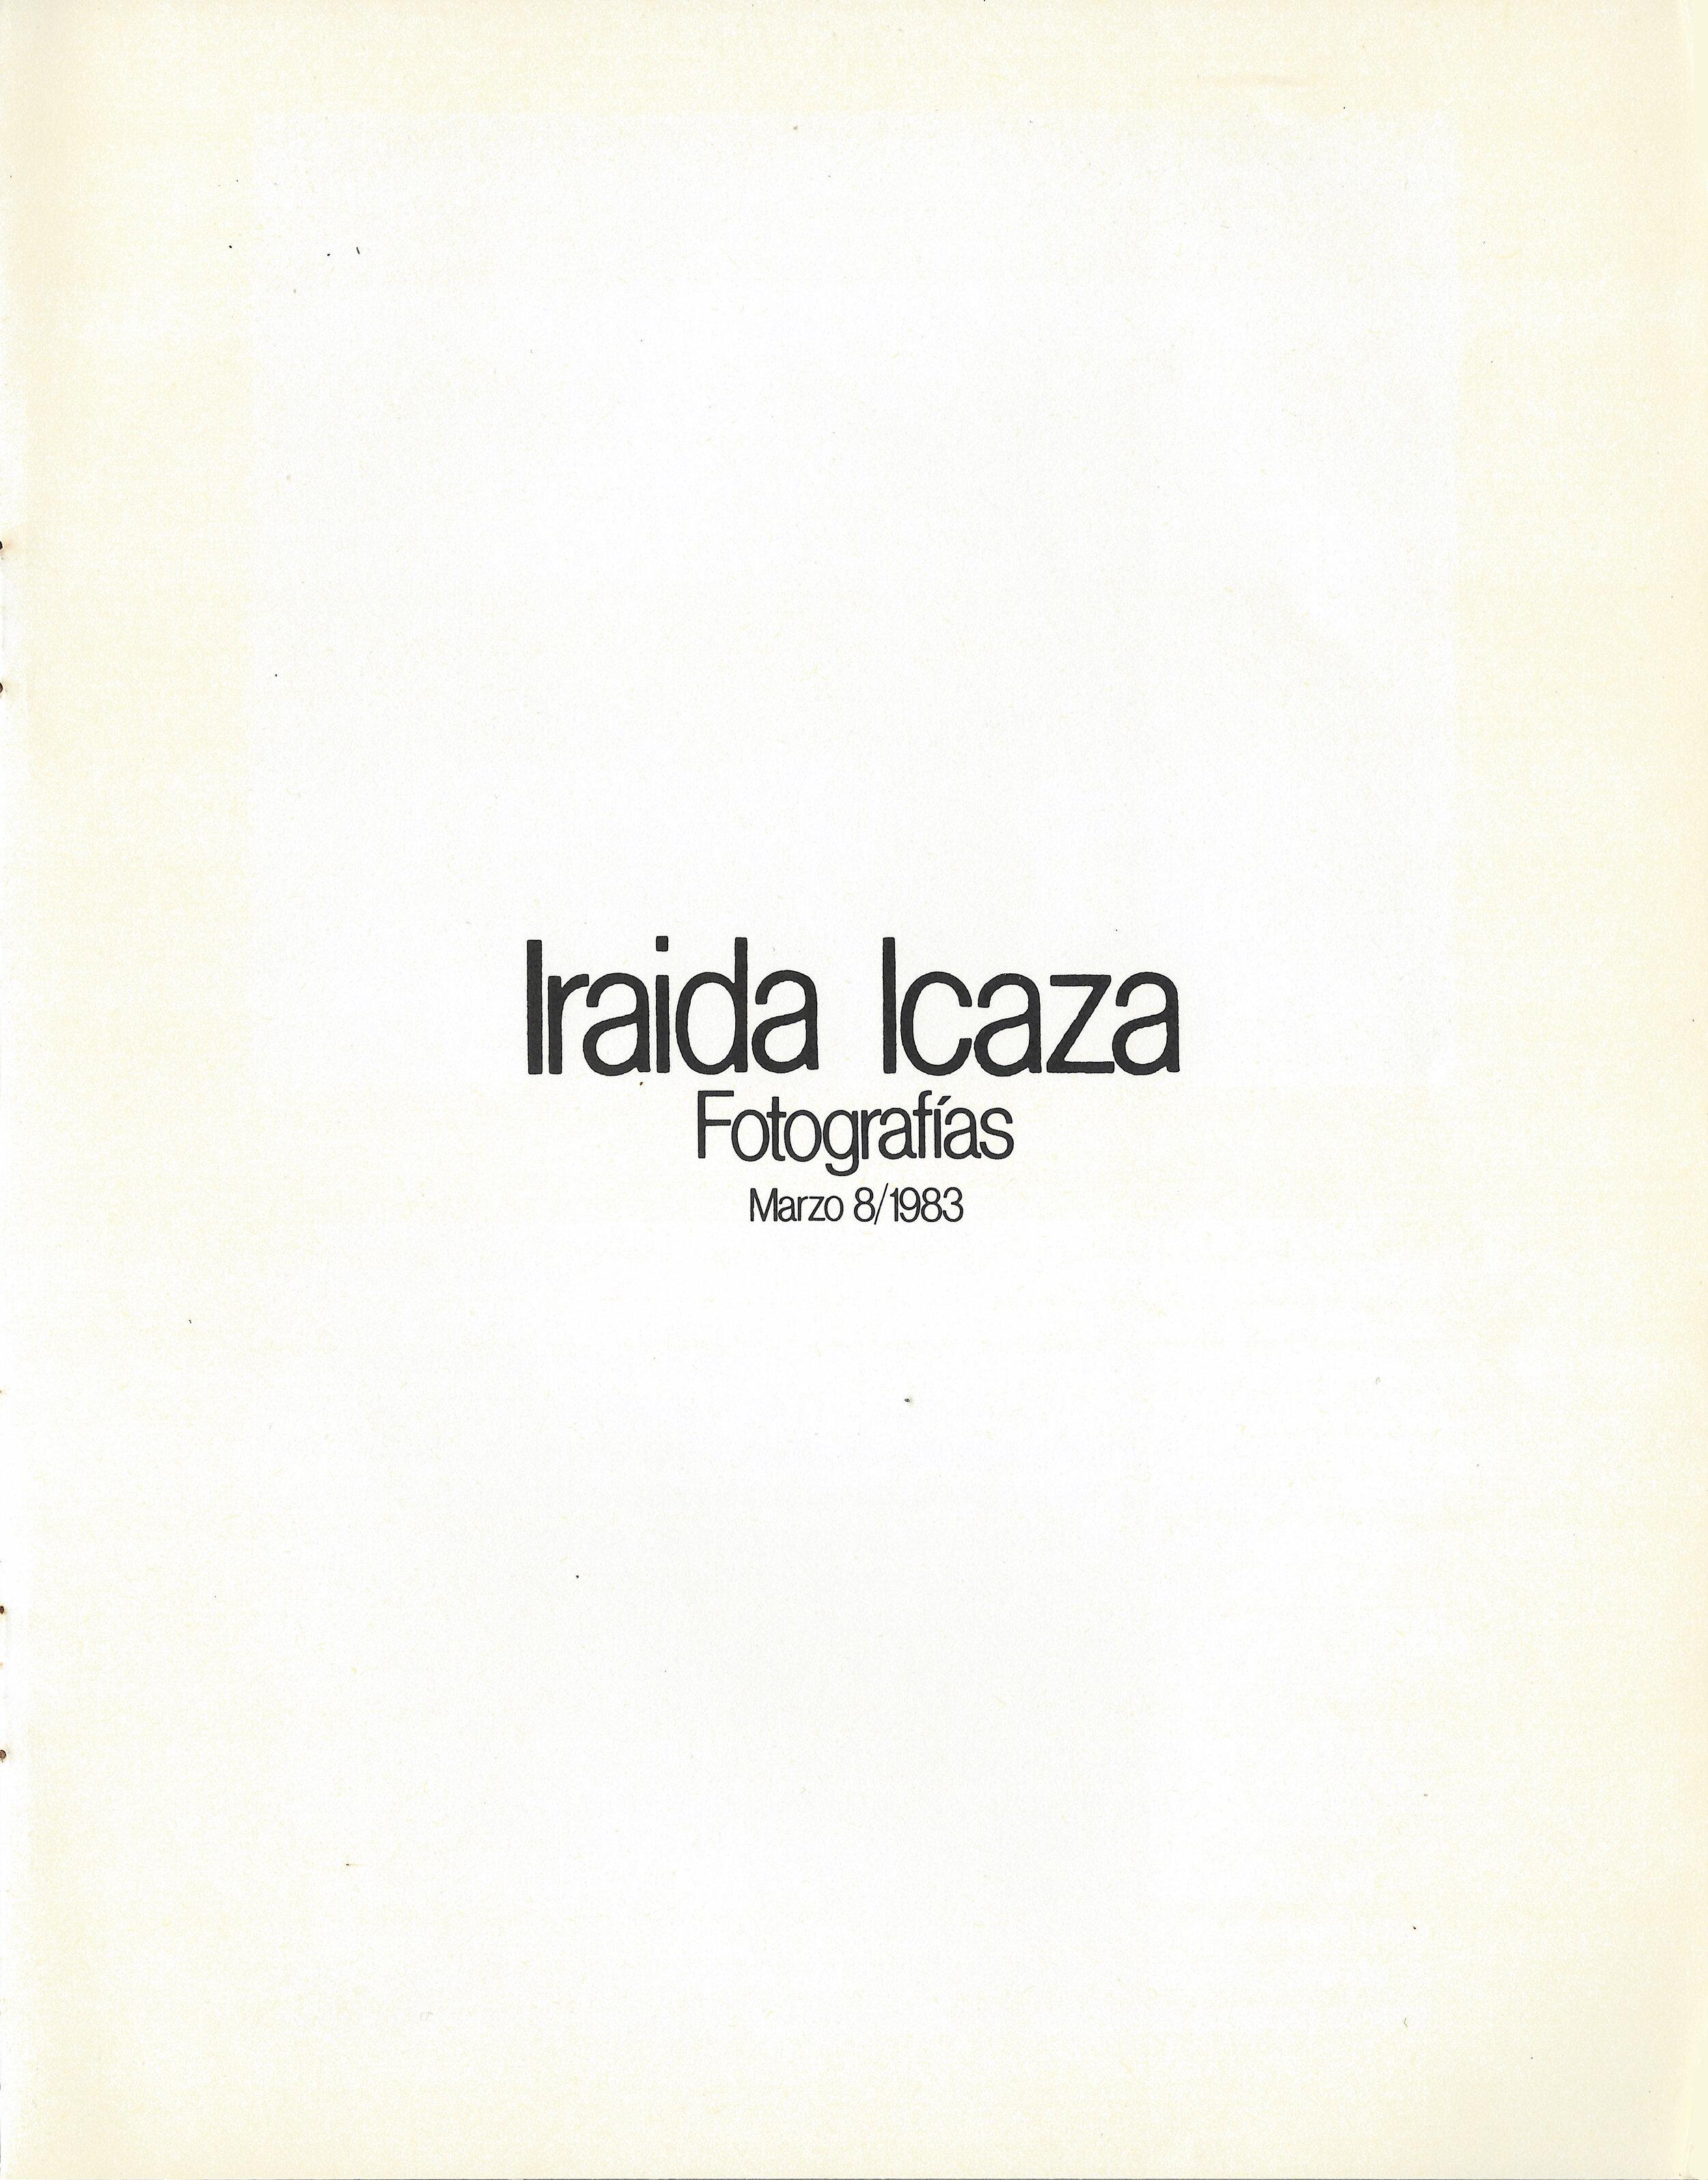 Icaza-1983 1-0.jpg